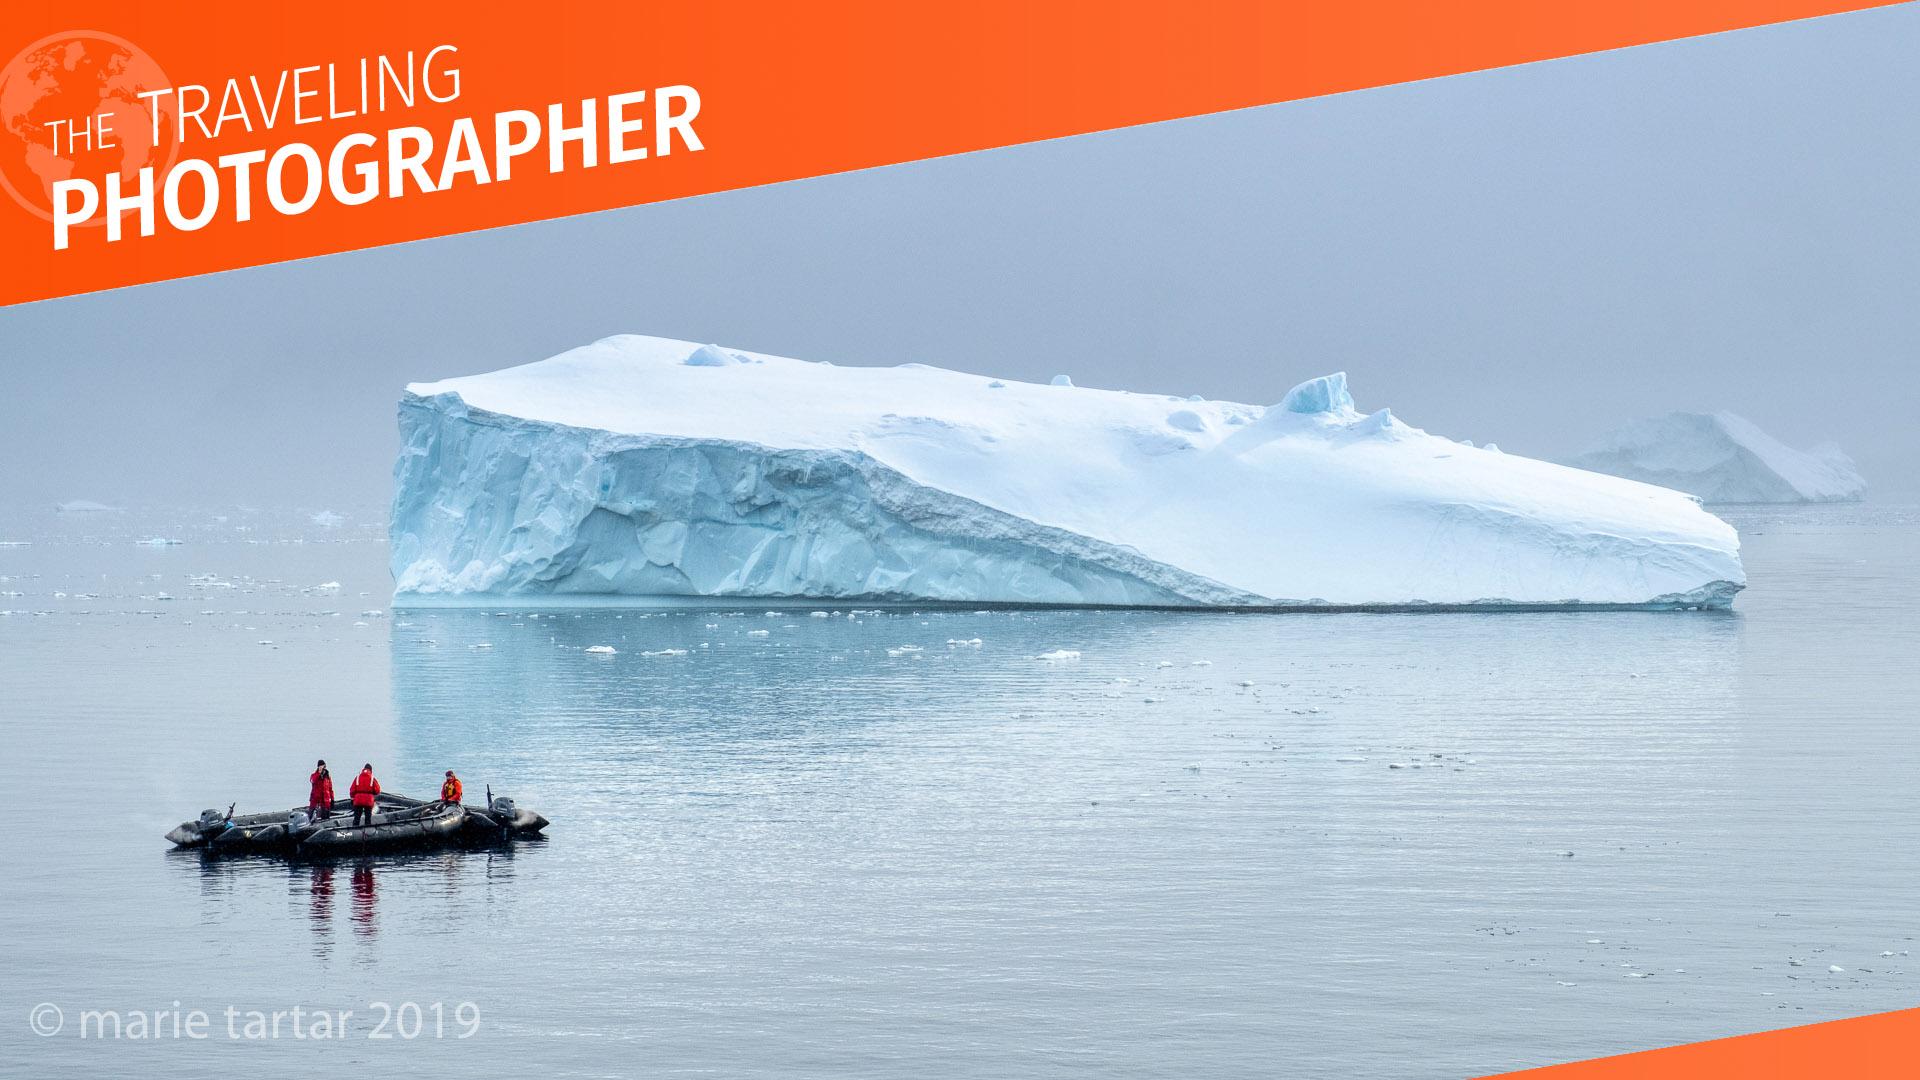 The Traveling Photographer: Choosing a trip to Antarctica, part 3 | Photofocus